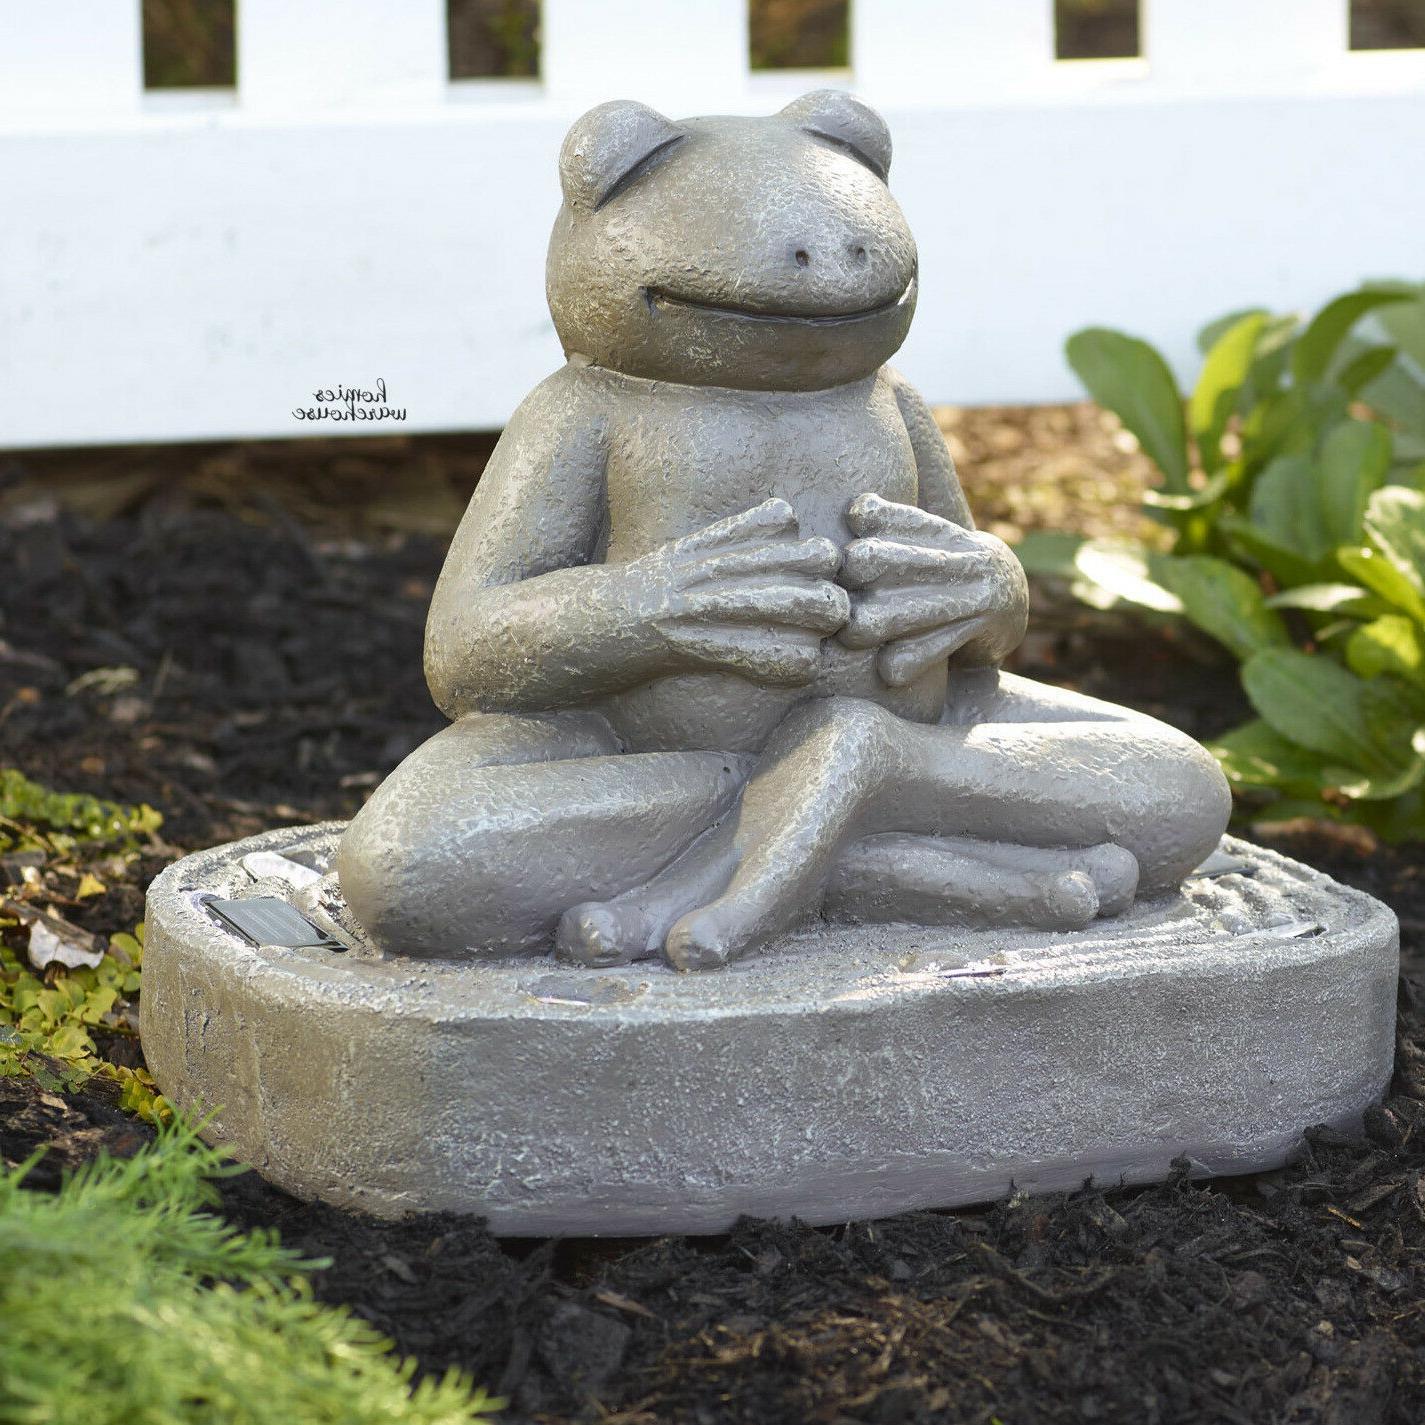 Frog Garden Statue Sculpture Solar Lighted Resin Figurine Pa